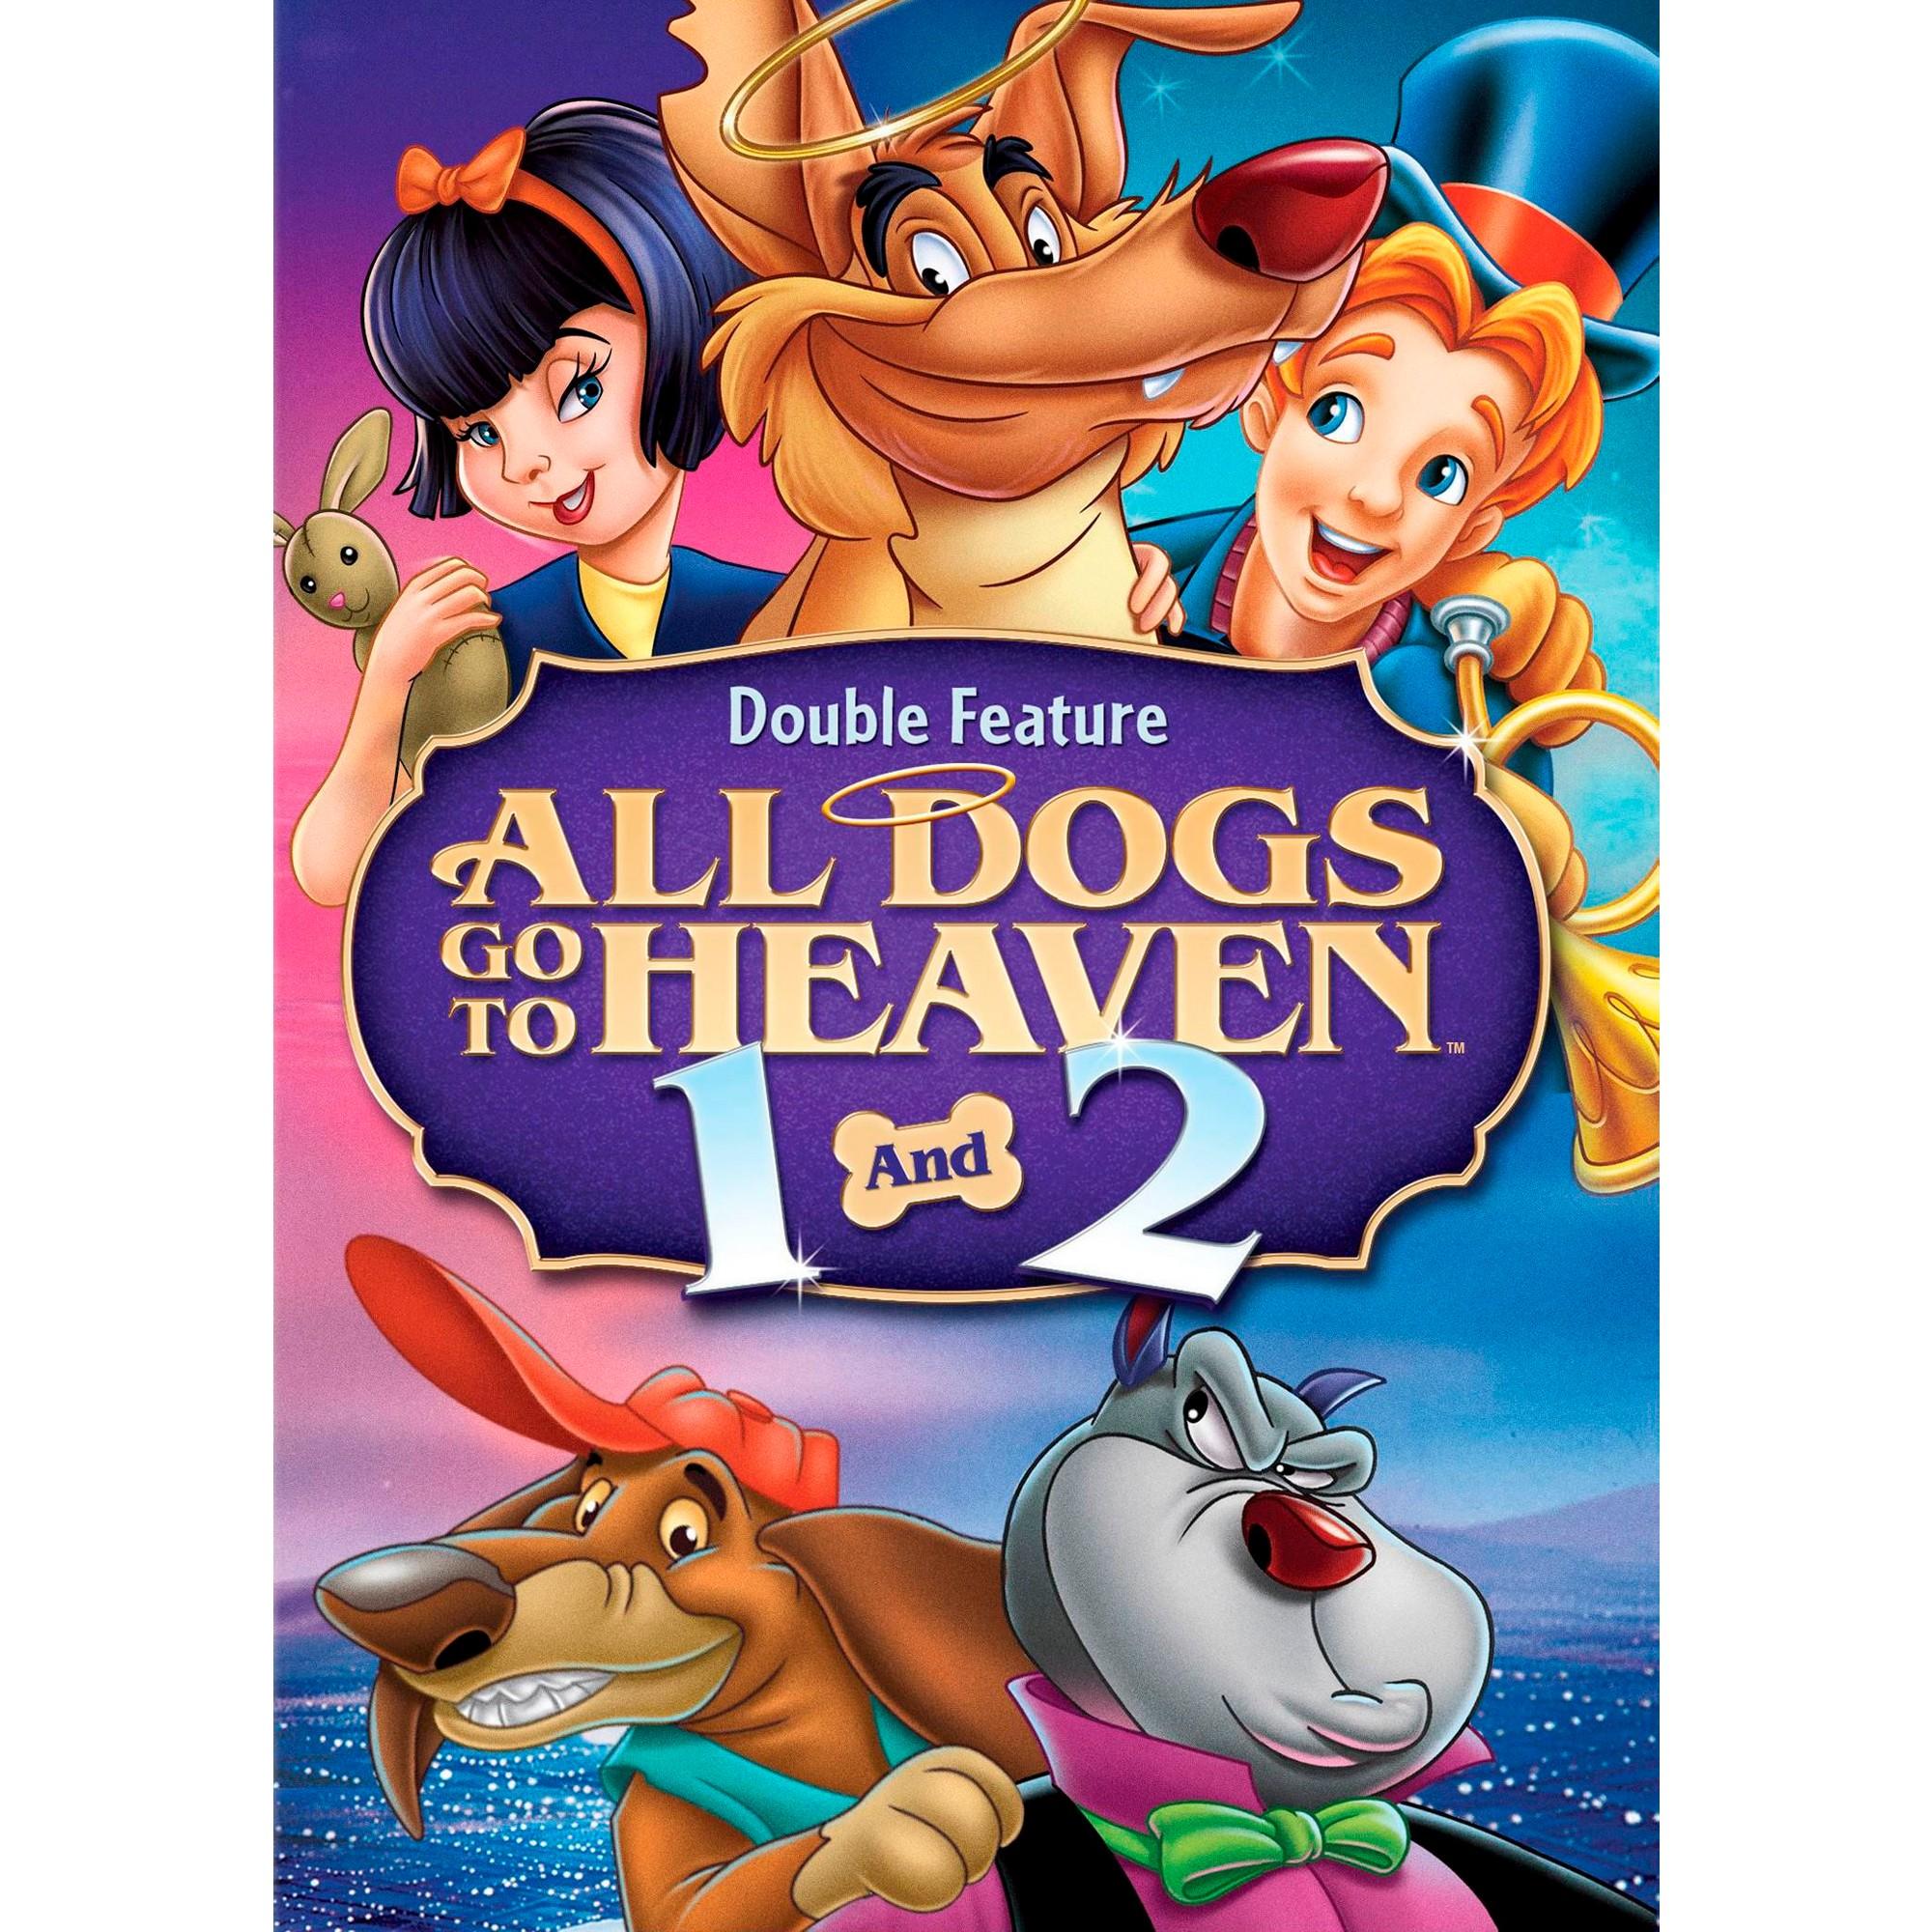 All Dogs Go To Heaven All Dogs Go To Heaven 2 2 Discs Dvd Video